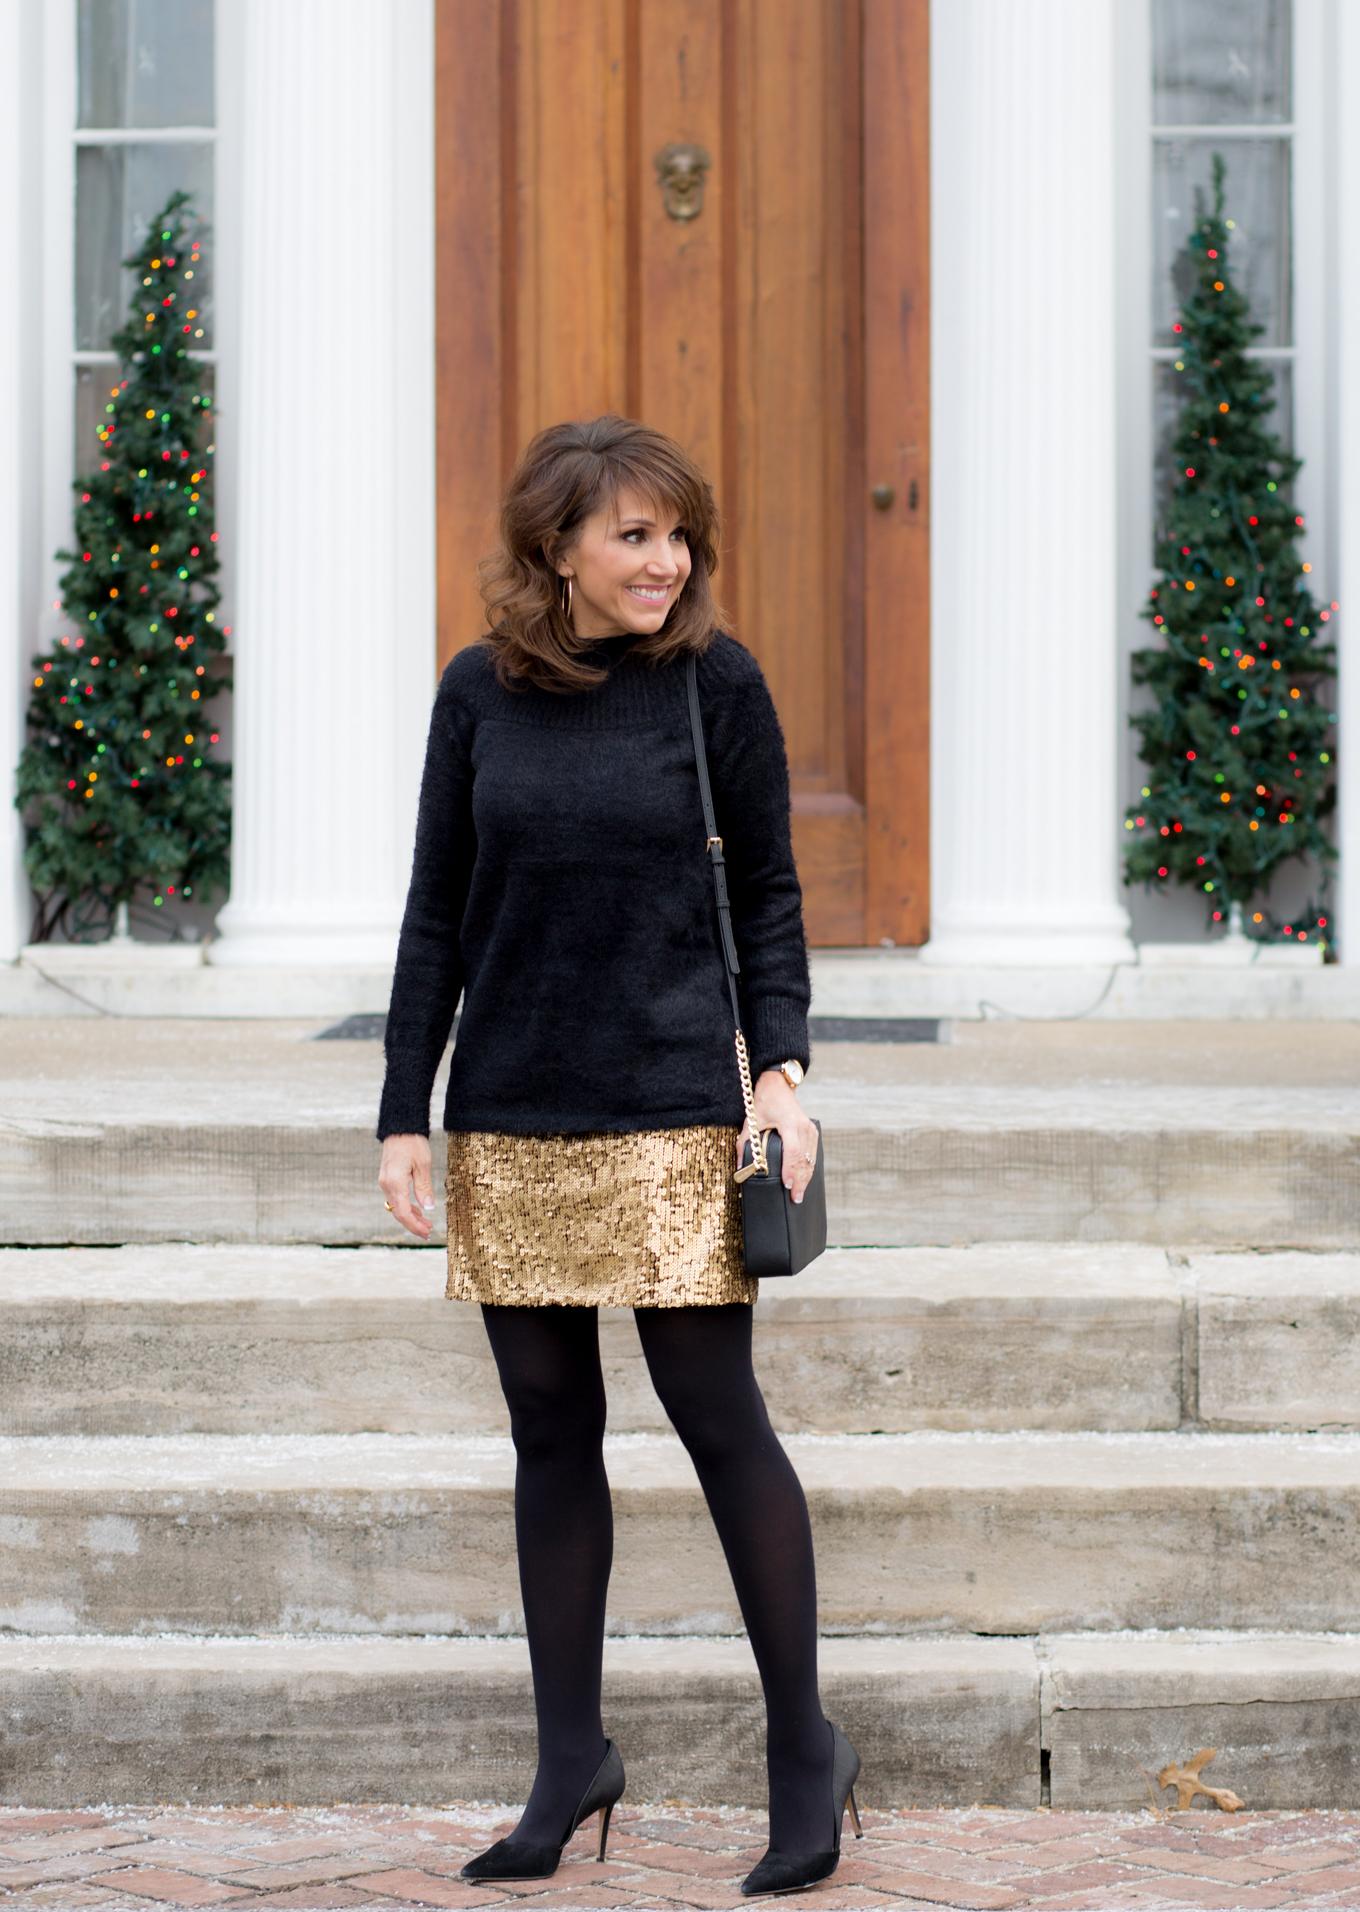 Buy > sequin skirt black tights - OFF 79% - Free delivery - visitpoconos.com